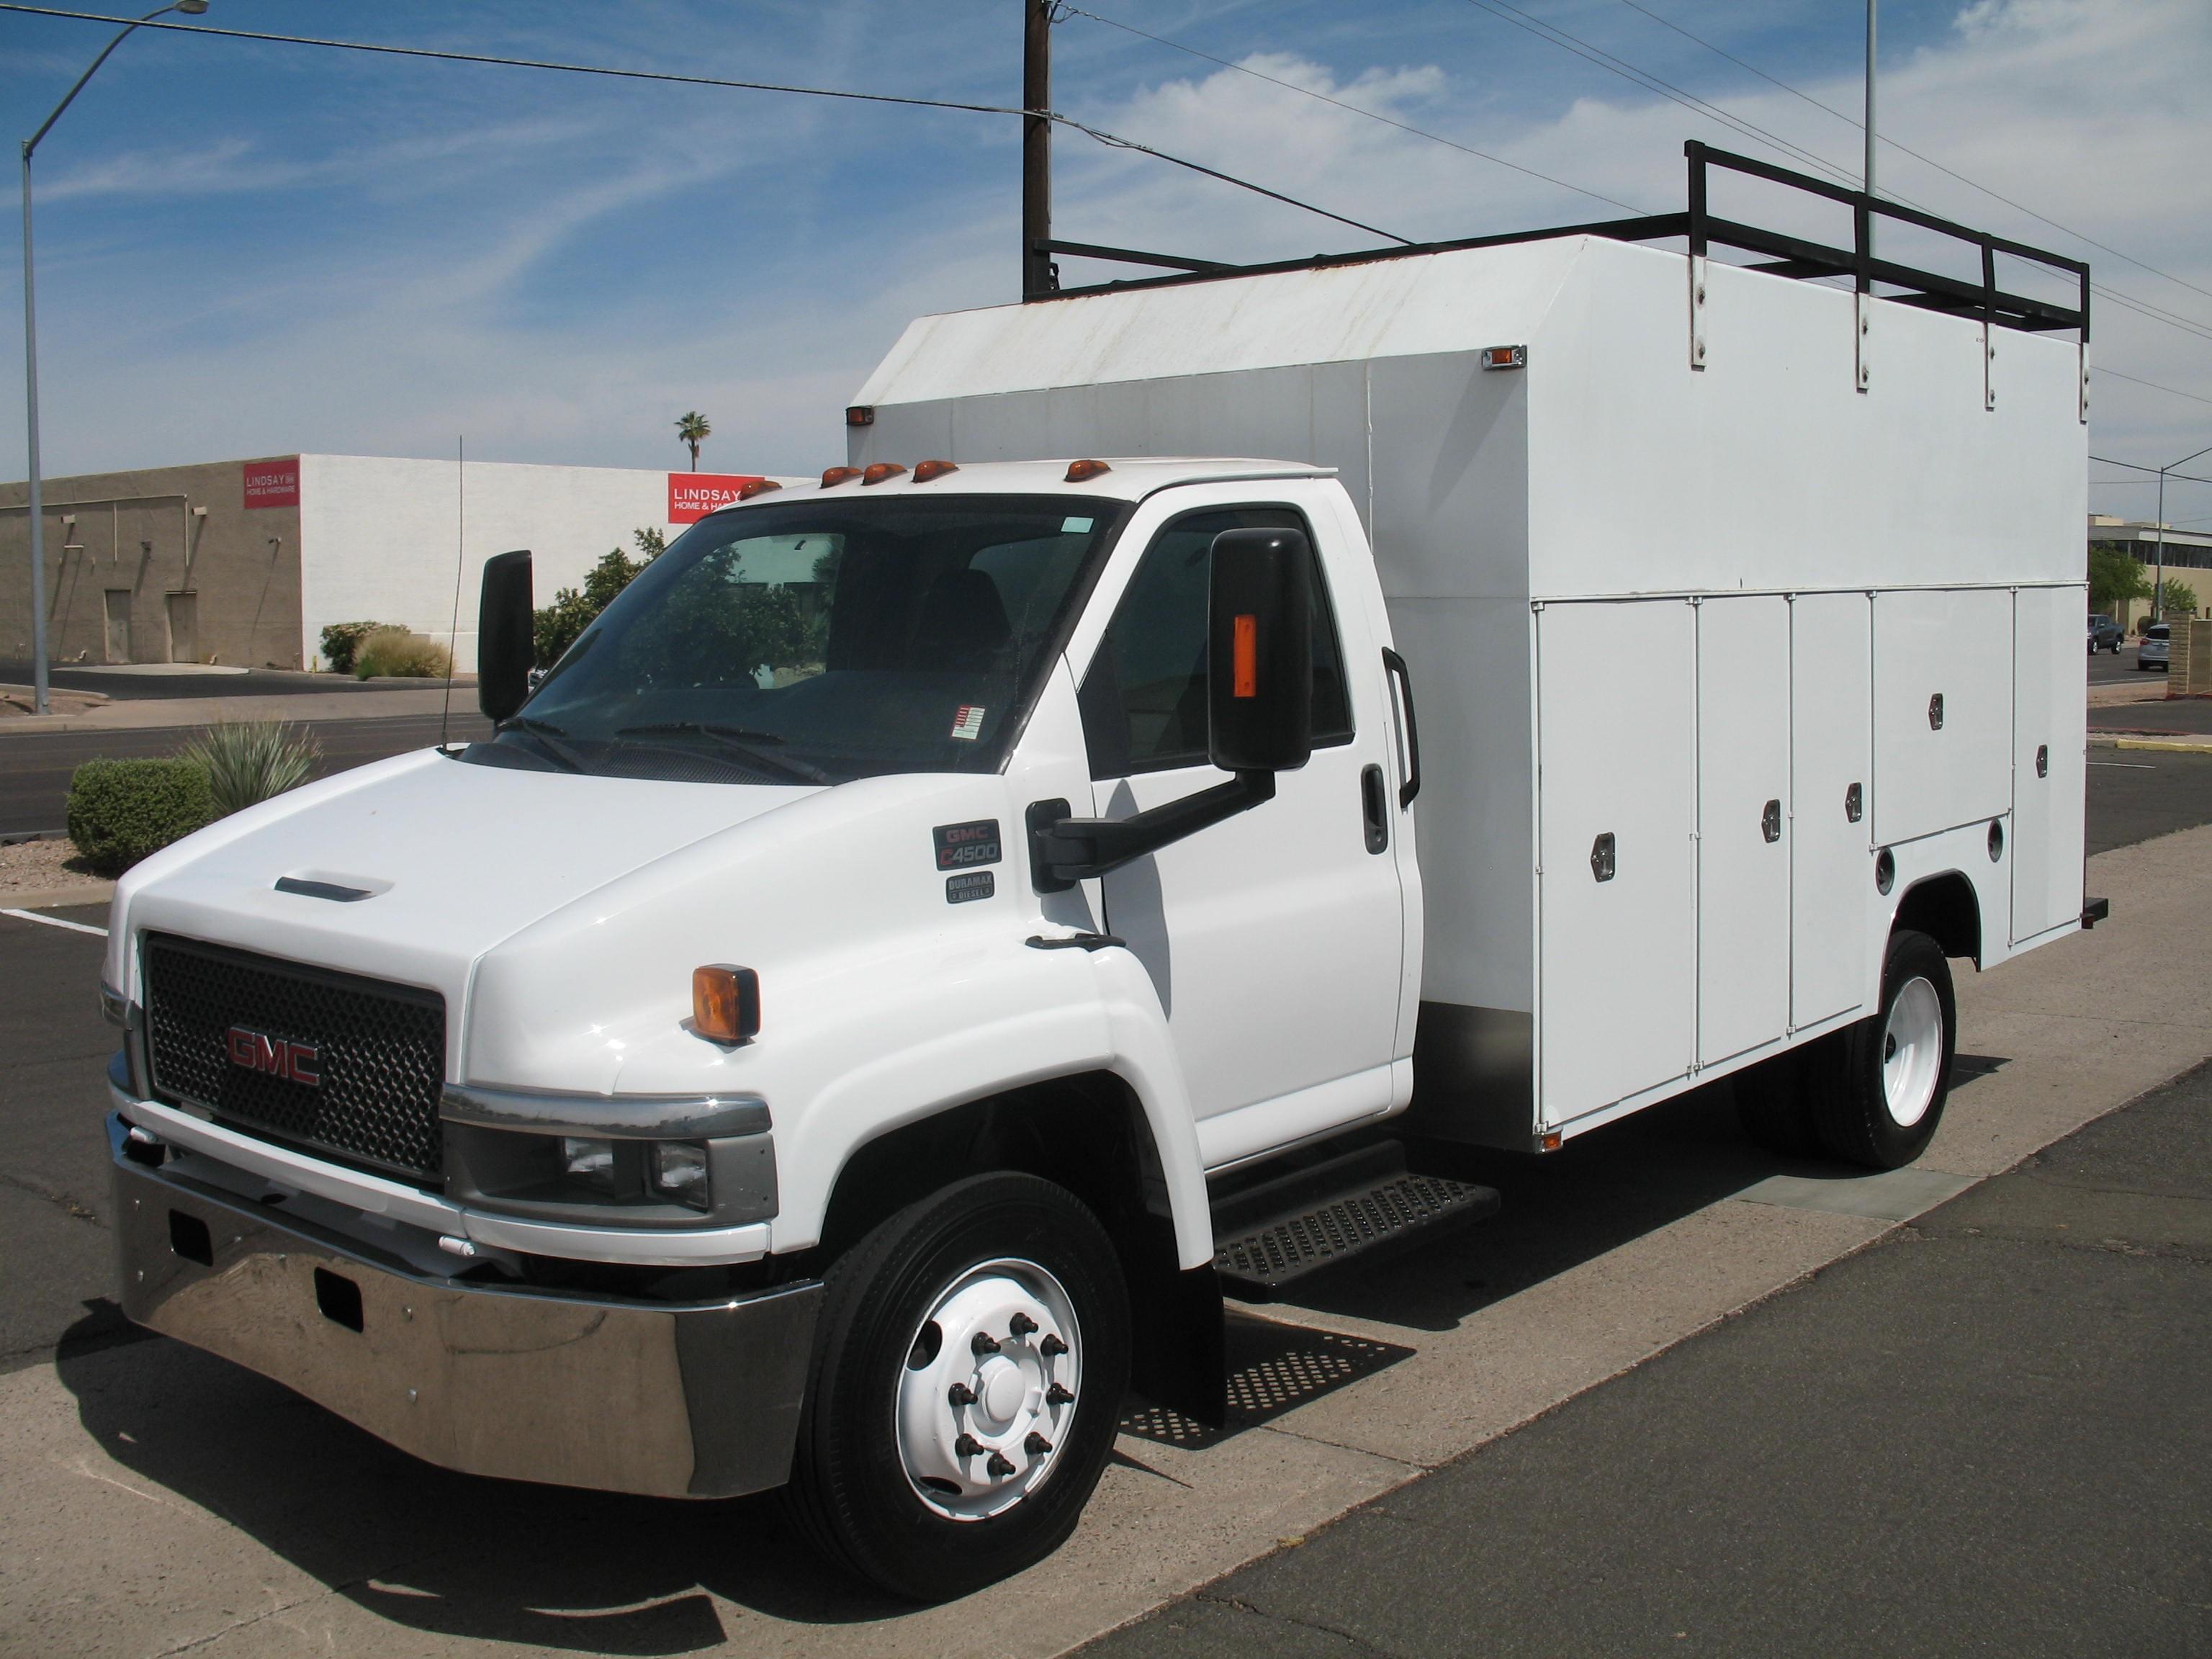 Used, 2005, GMC, C-4500 TOPKICK, Service / Utility Trucks